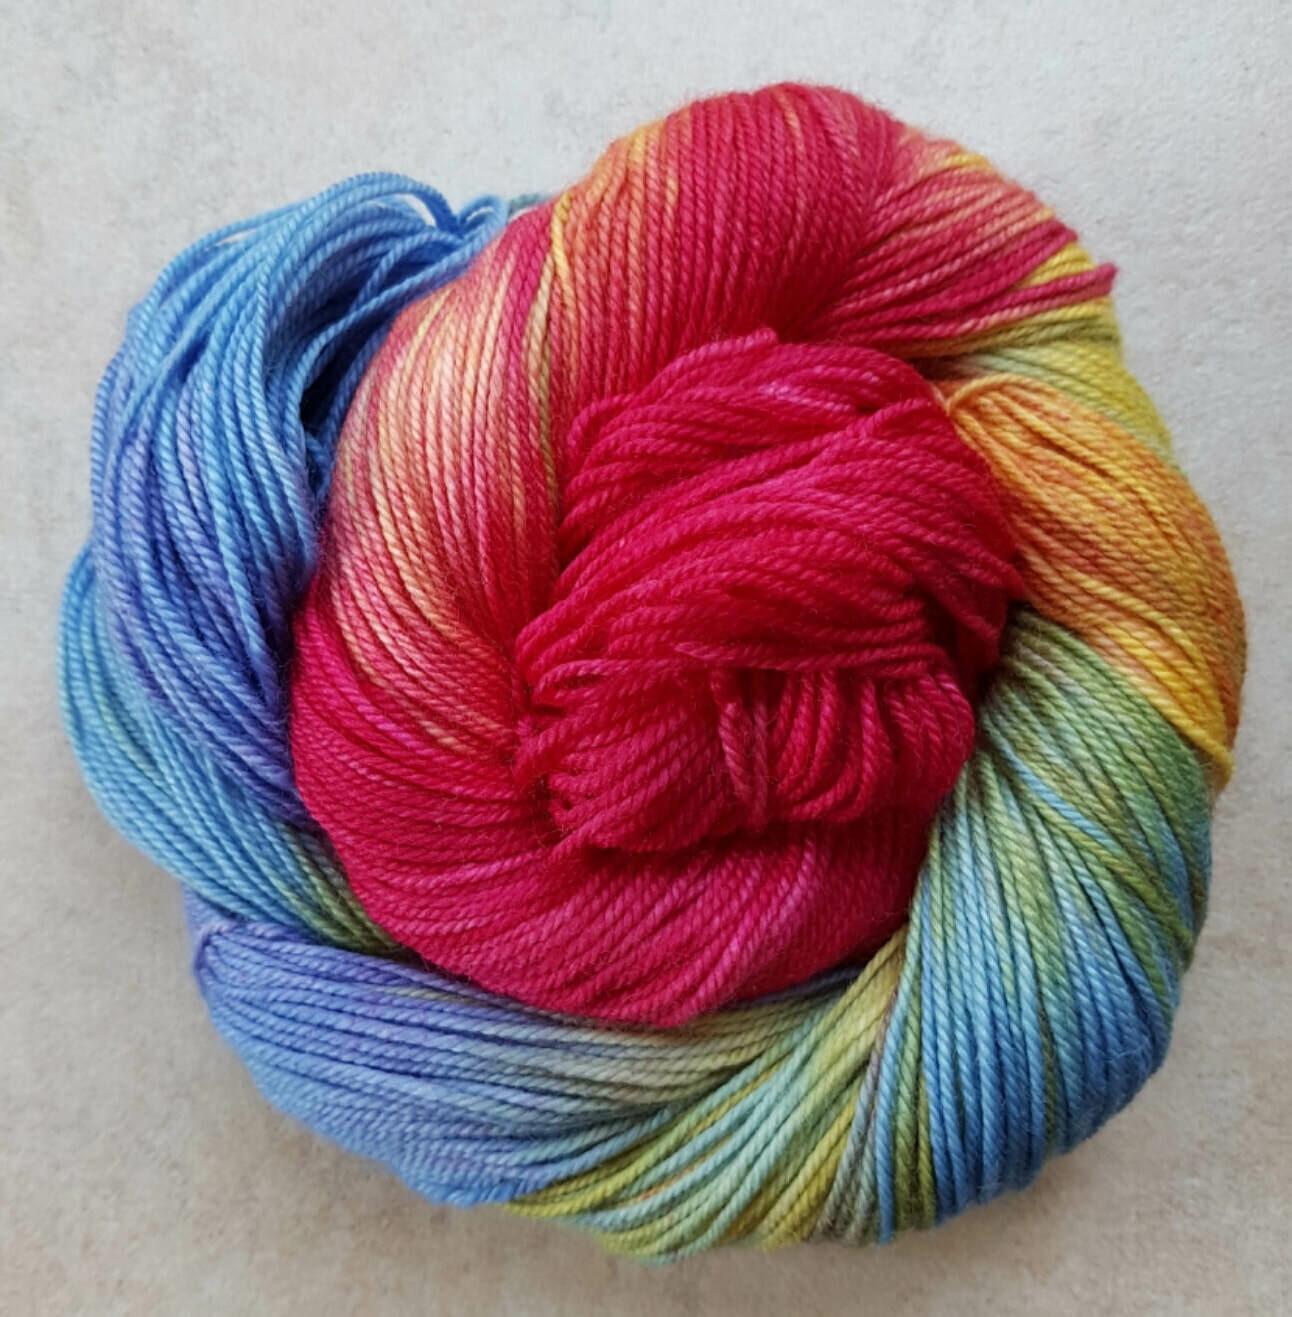 Riverstone Yarns - 80/20 Sock - Pixie Dust